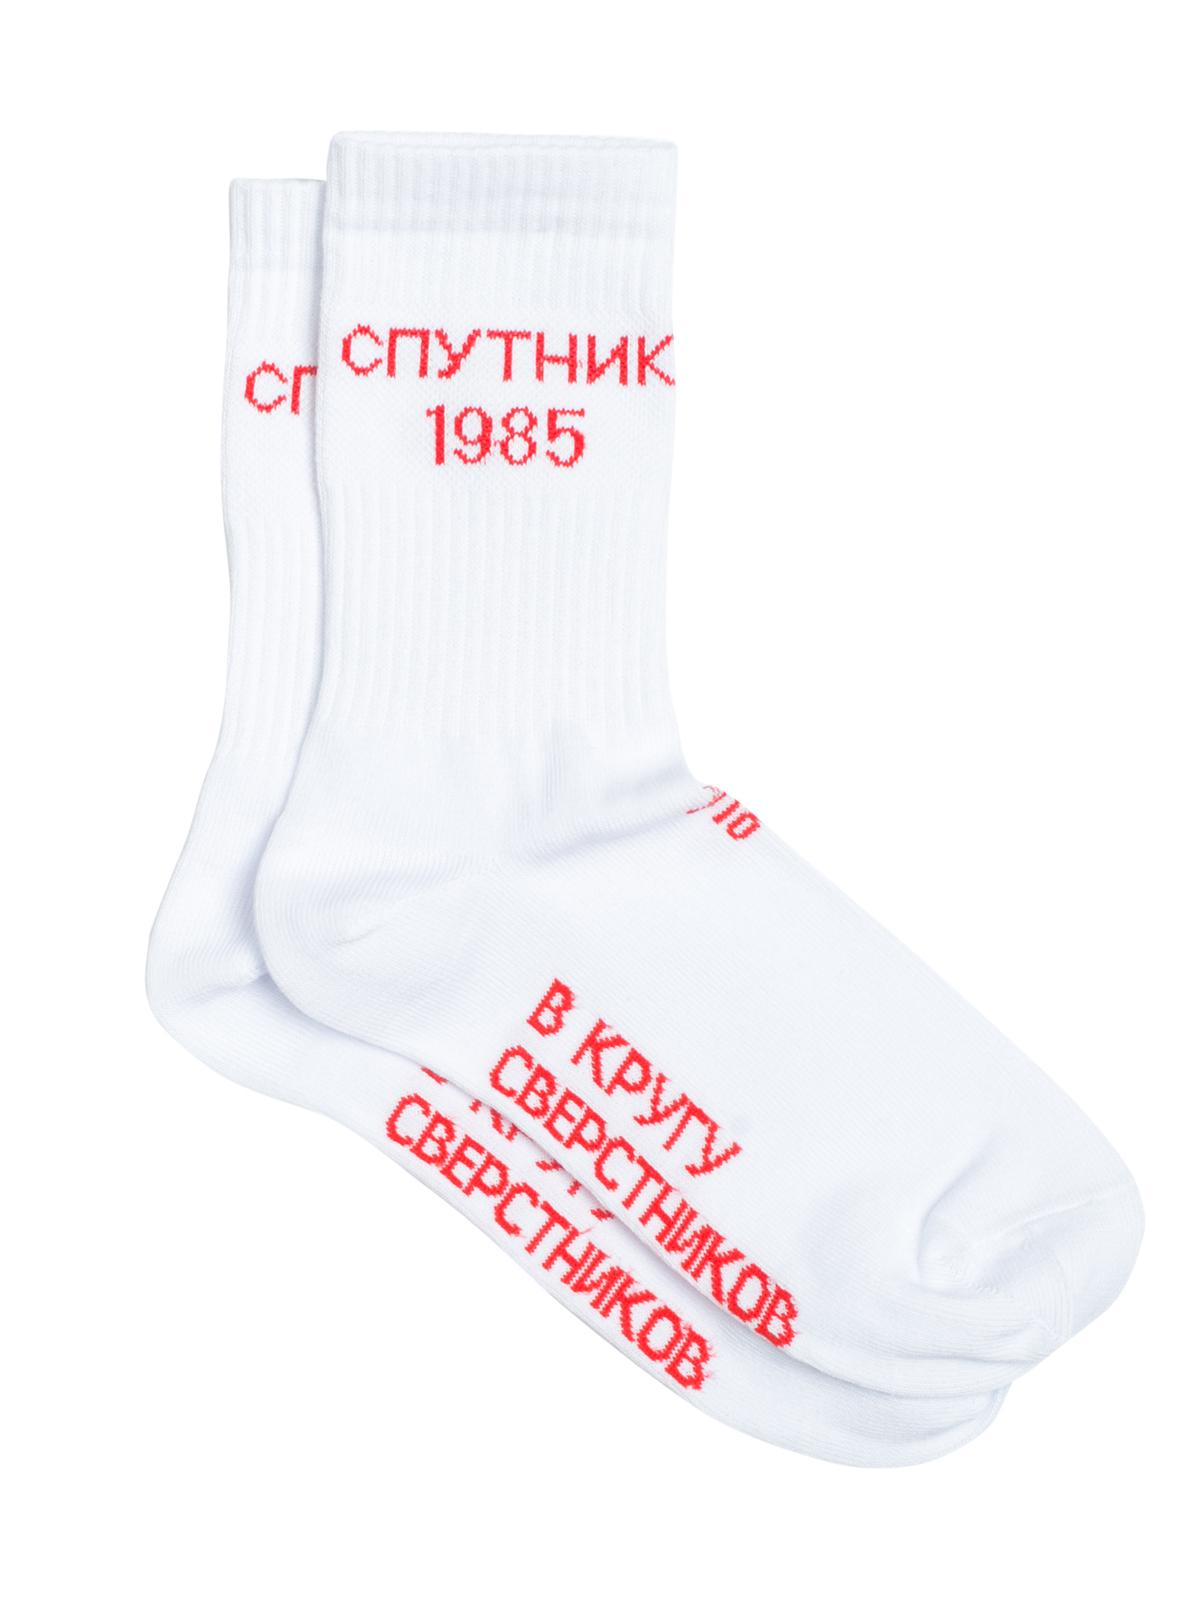 Носки спутник 1985 - H29 - 36-38рр